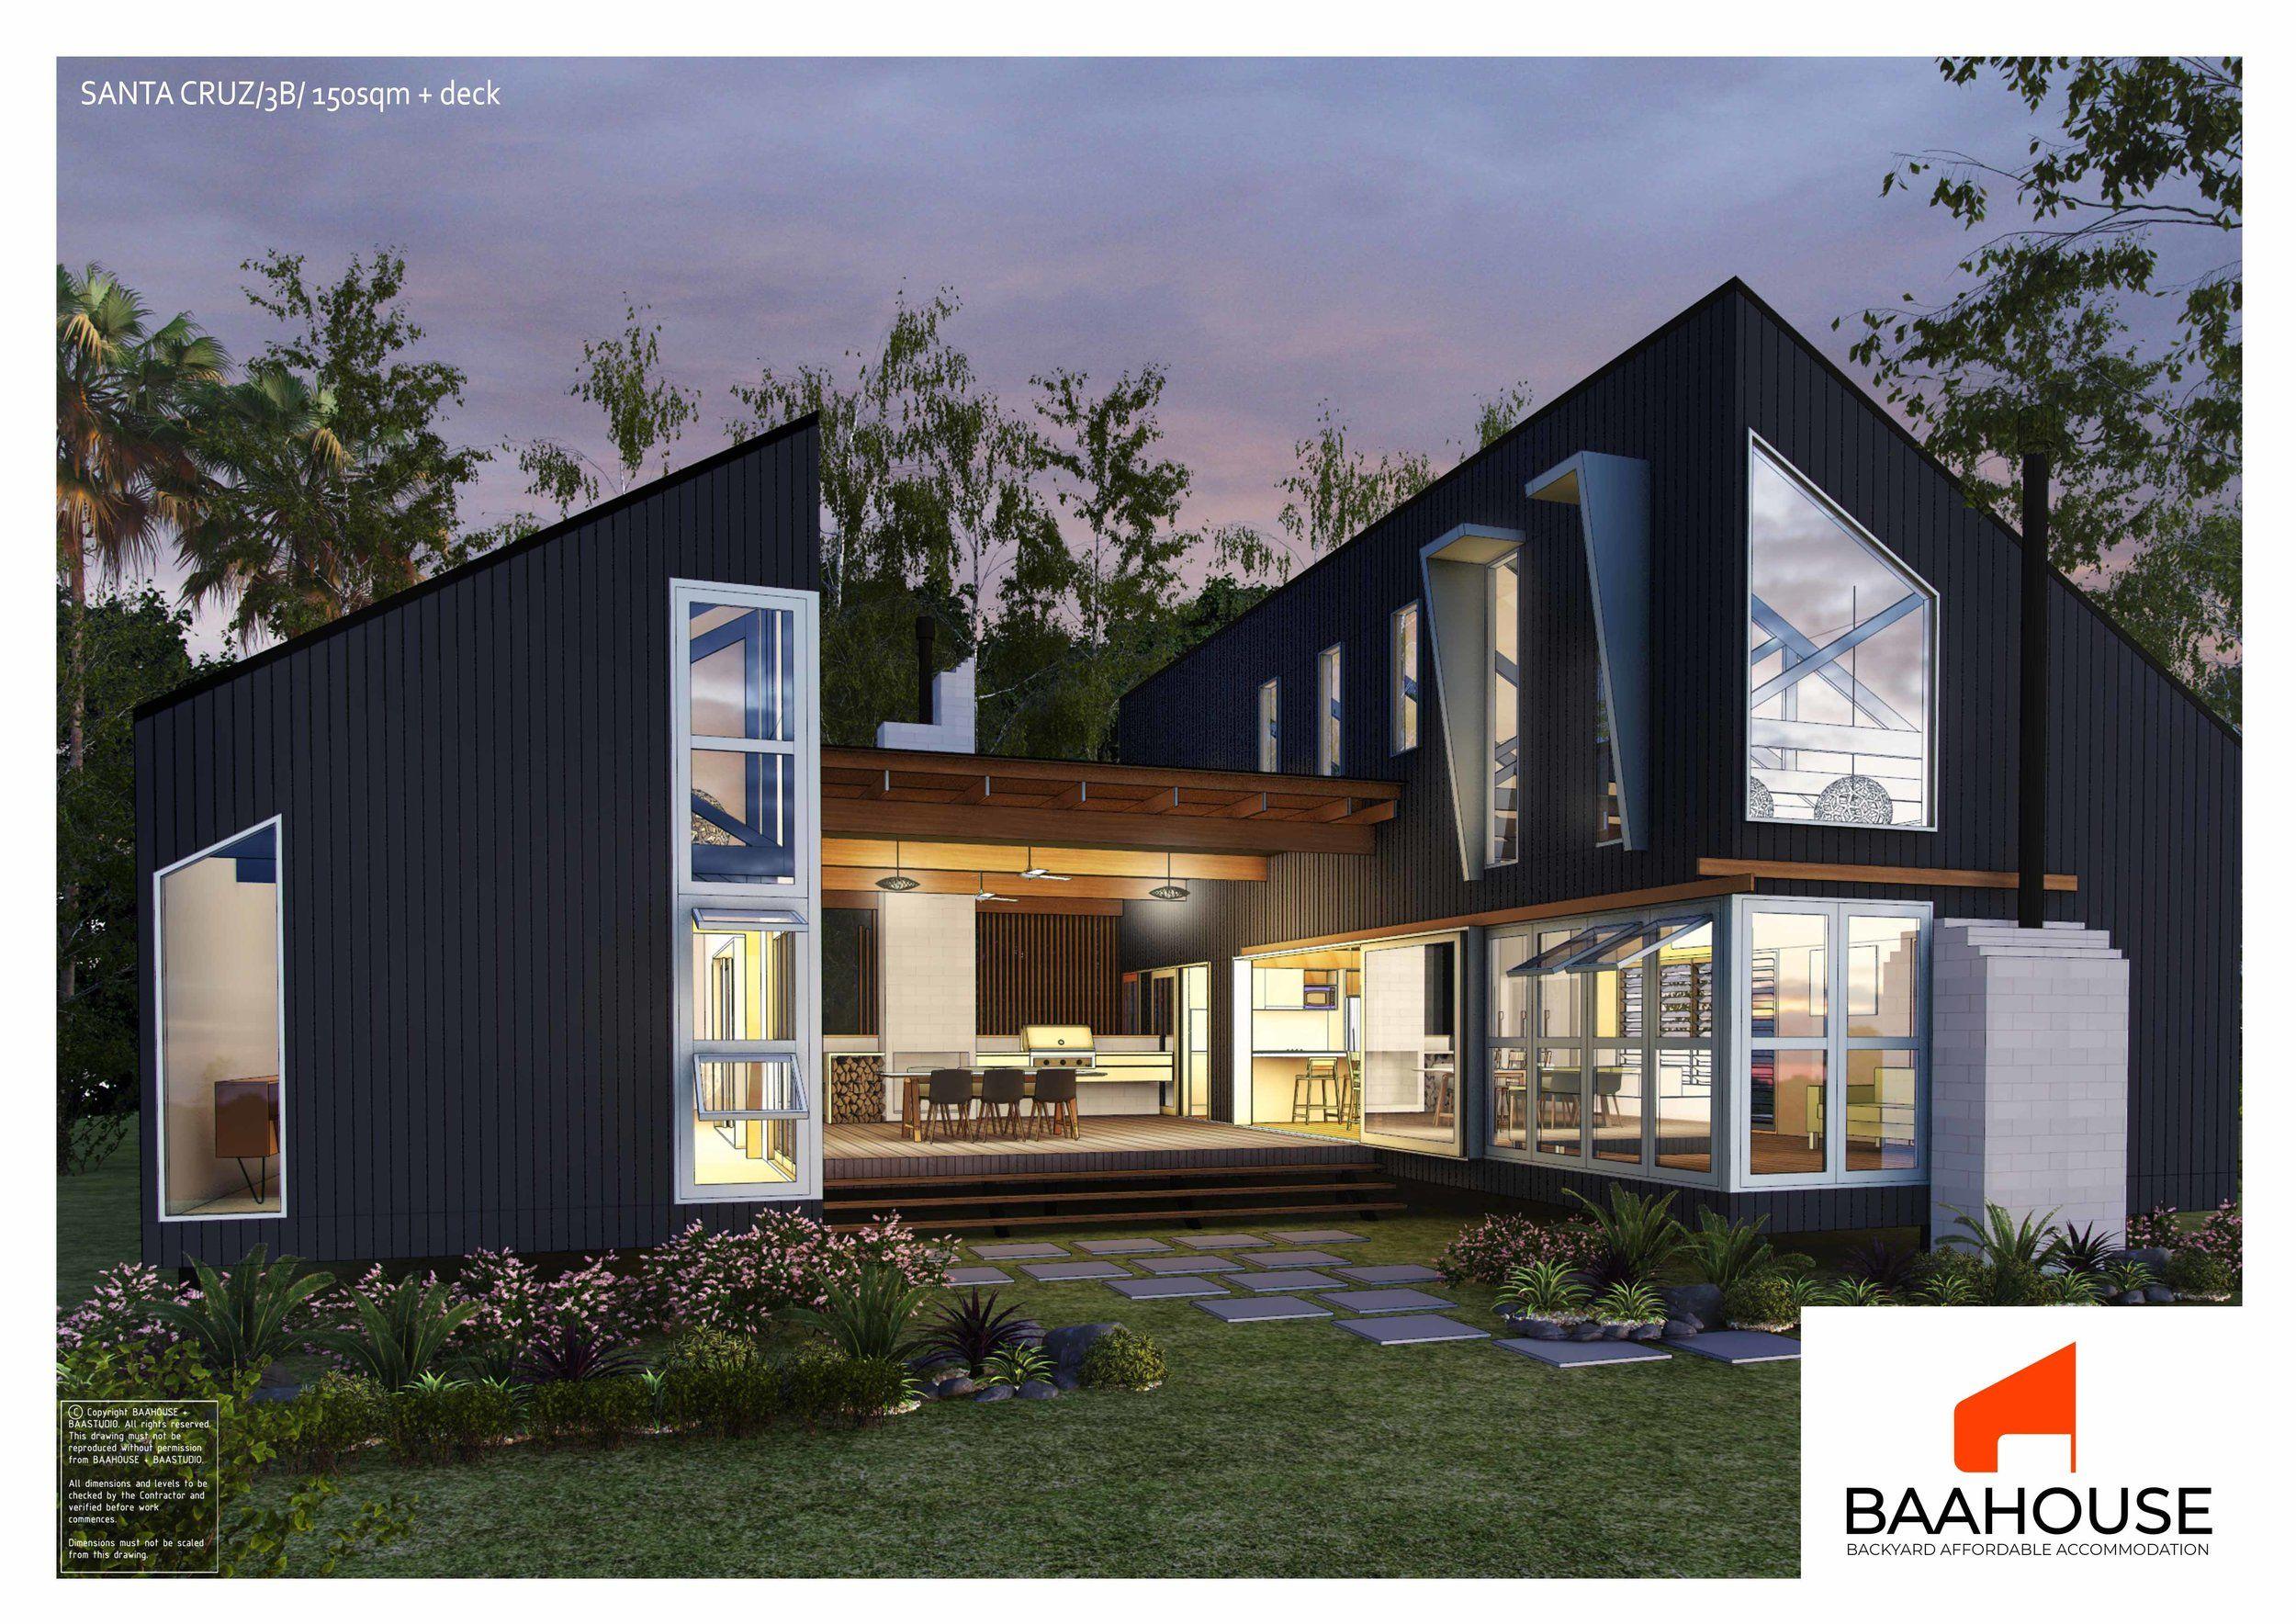 Santa Cruz 3bedroom 15osqm Design Small House Design Small House Australia Small House